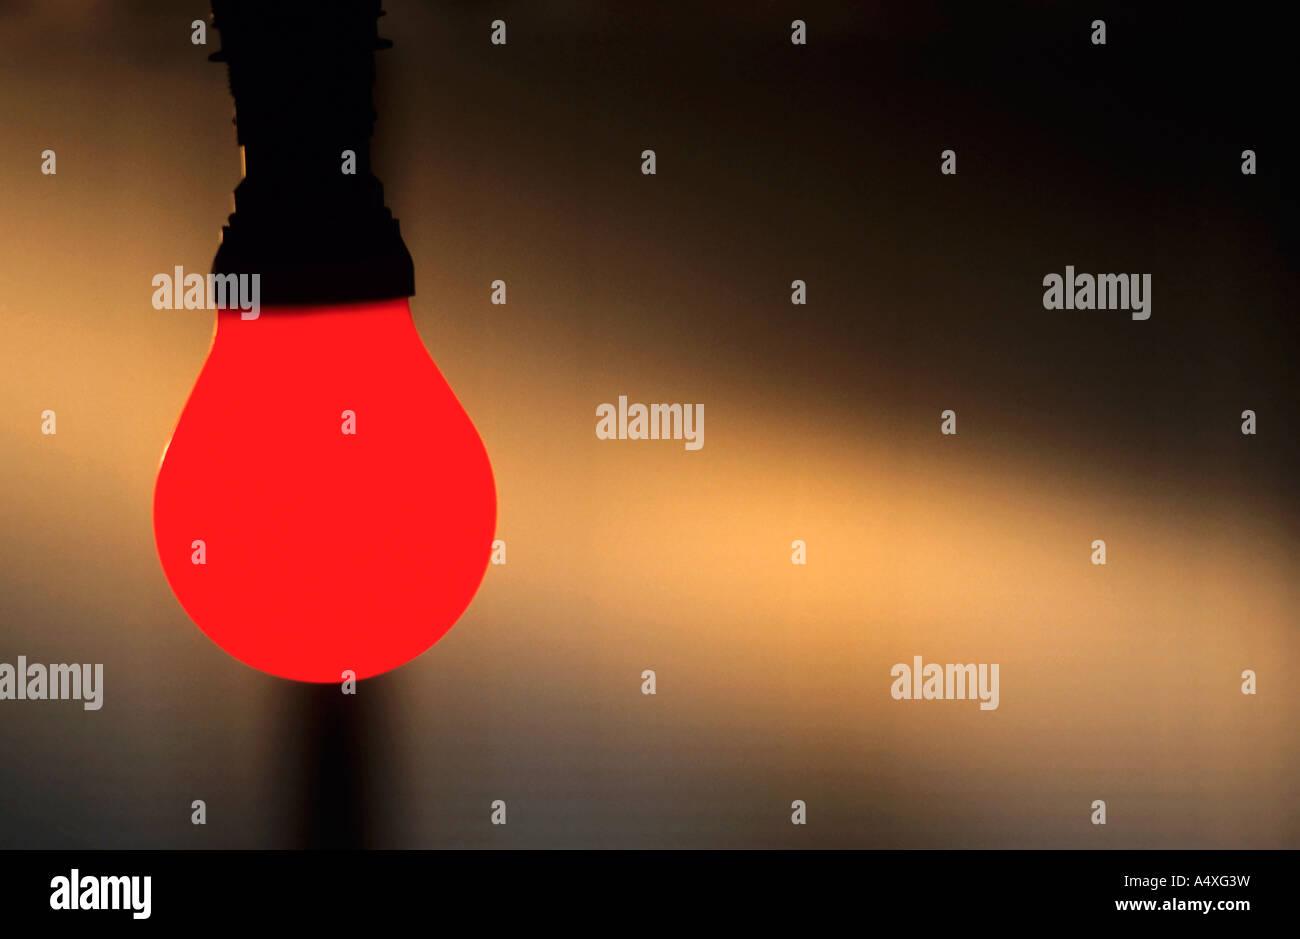 Illuminated red light bulb. - Stock Image